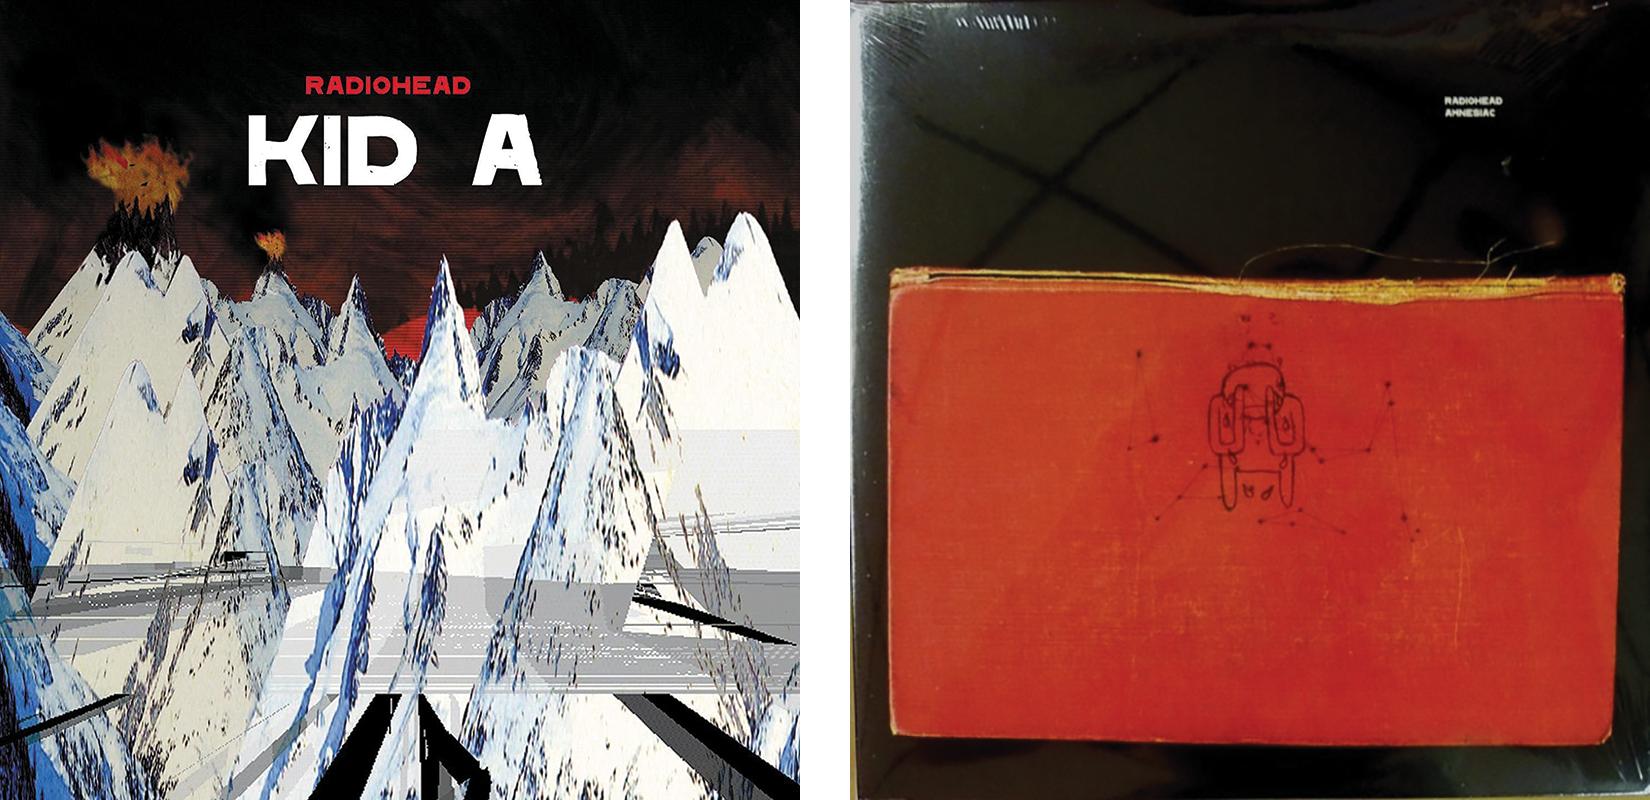 Radiohead S Kid A And Amnesiac Are Now On Heavyweight 12